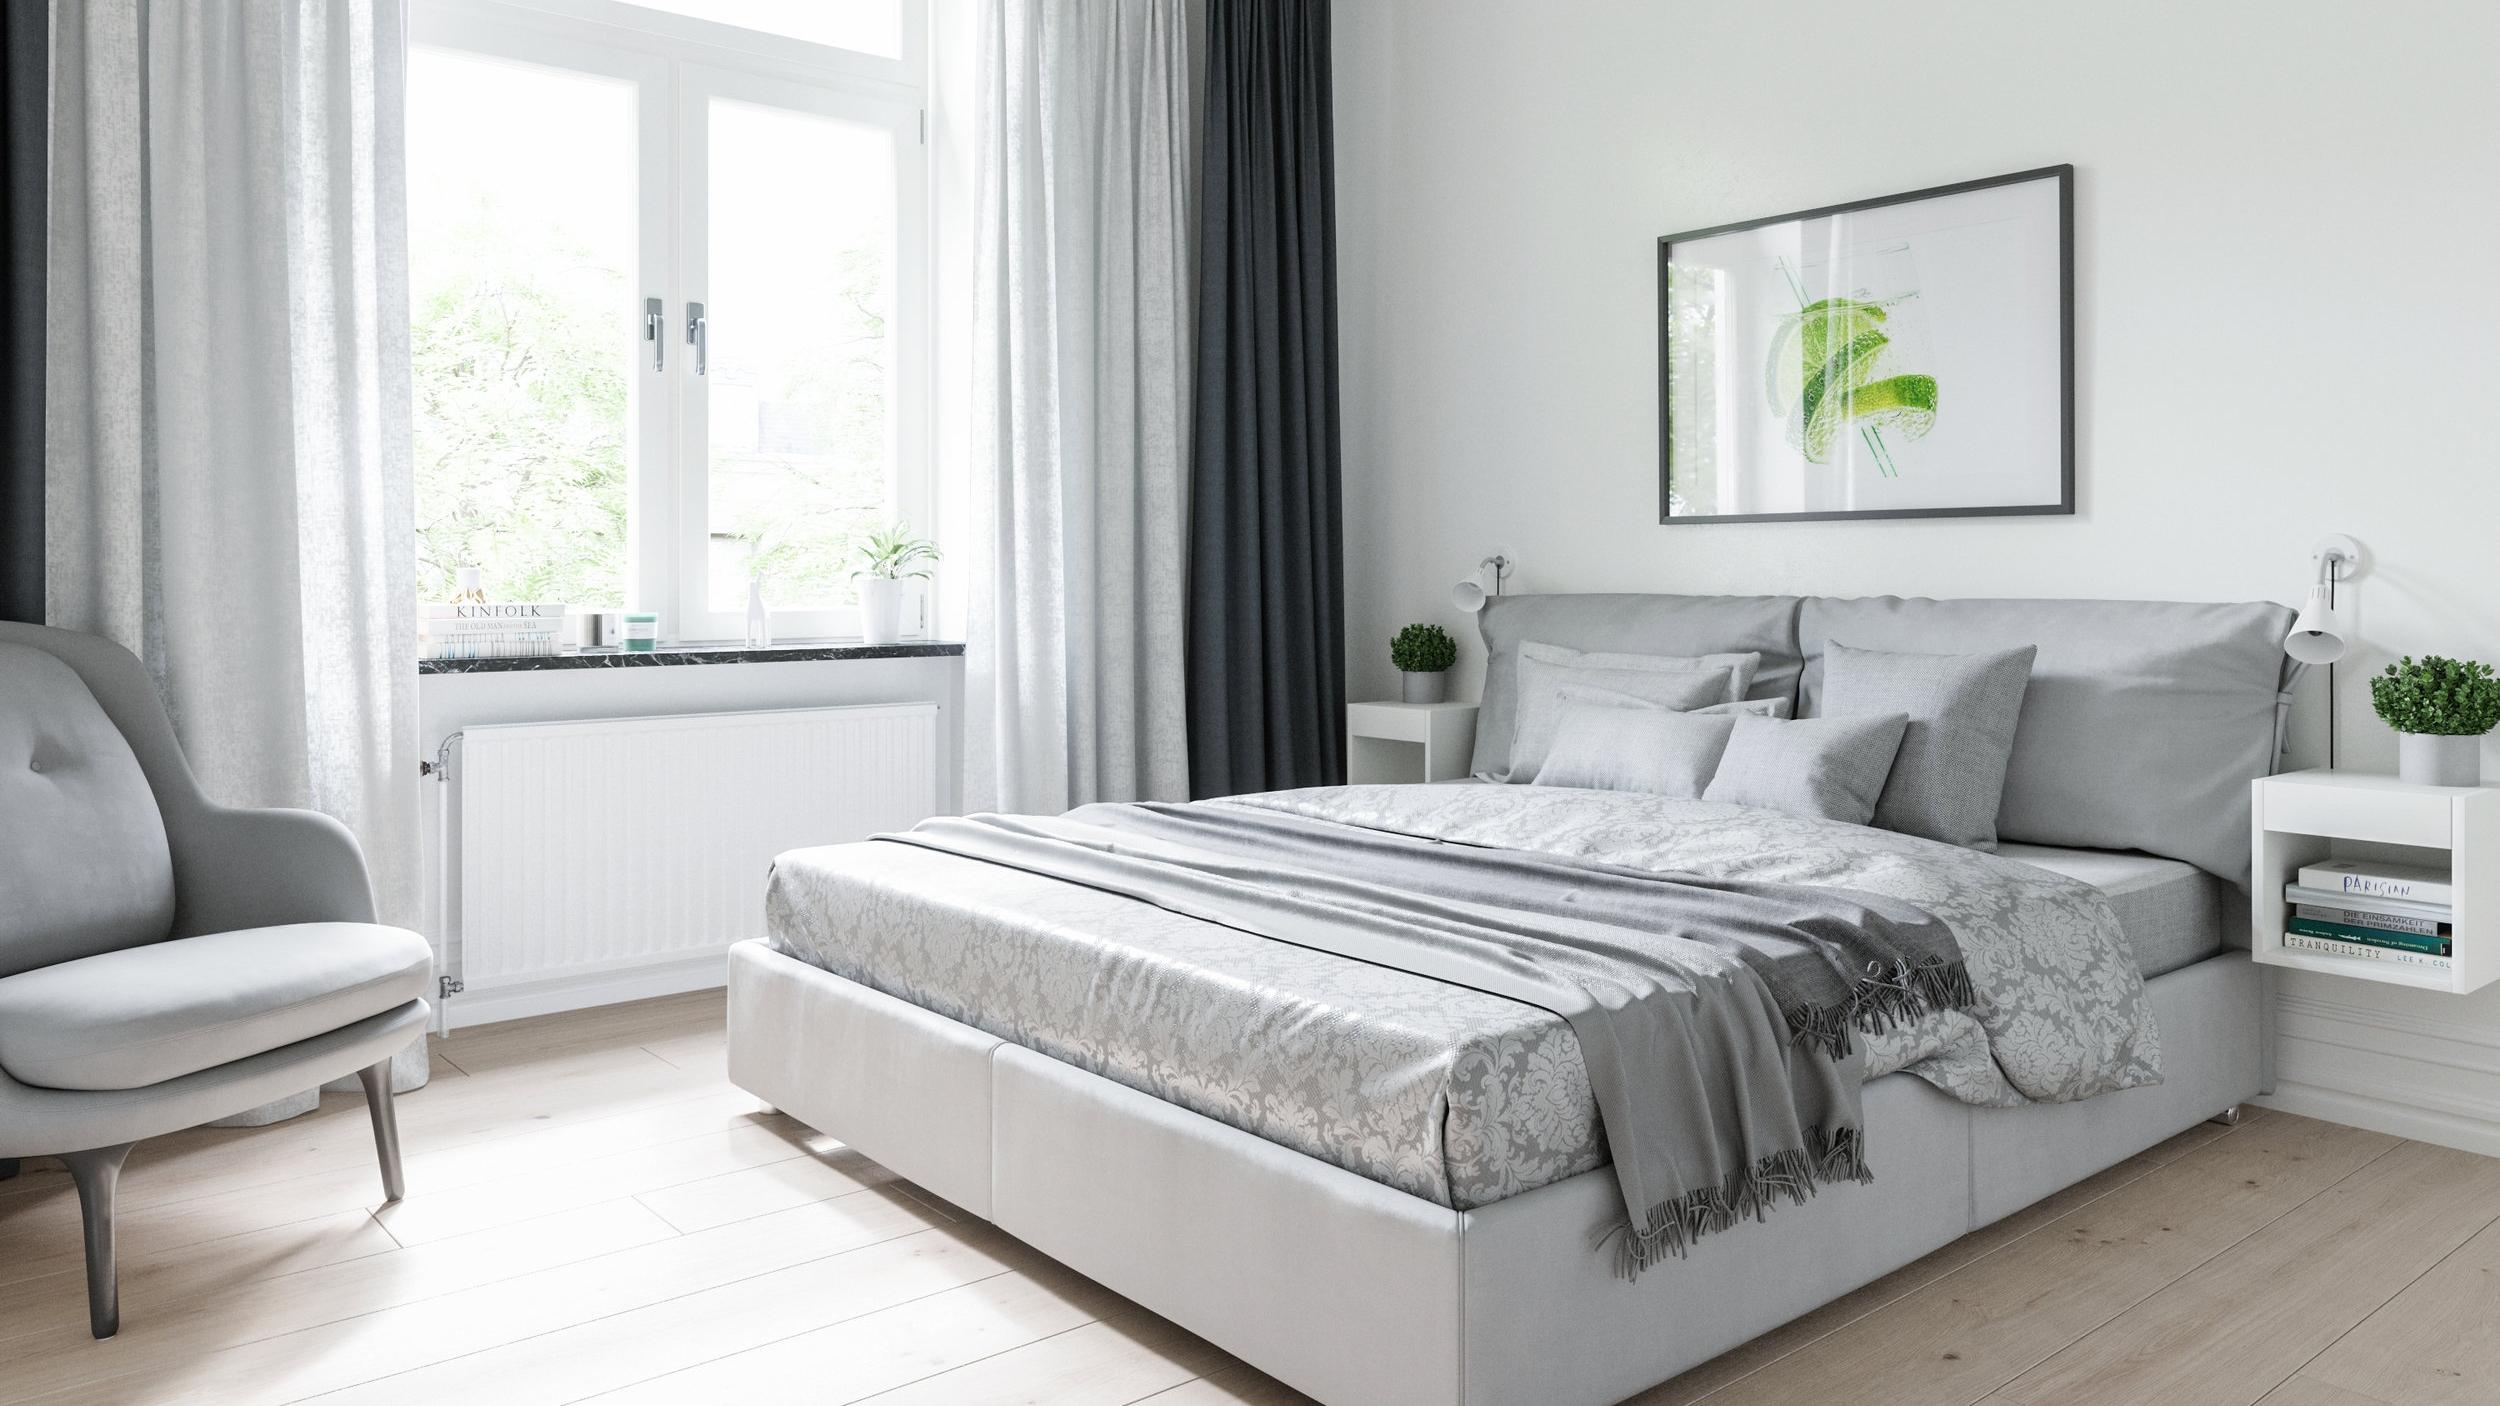 Bedroom_Render_Done